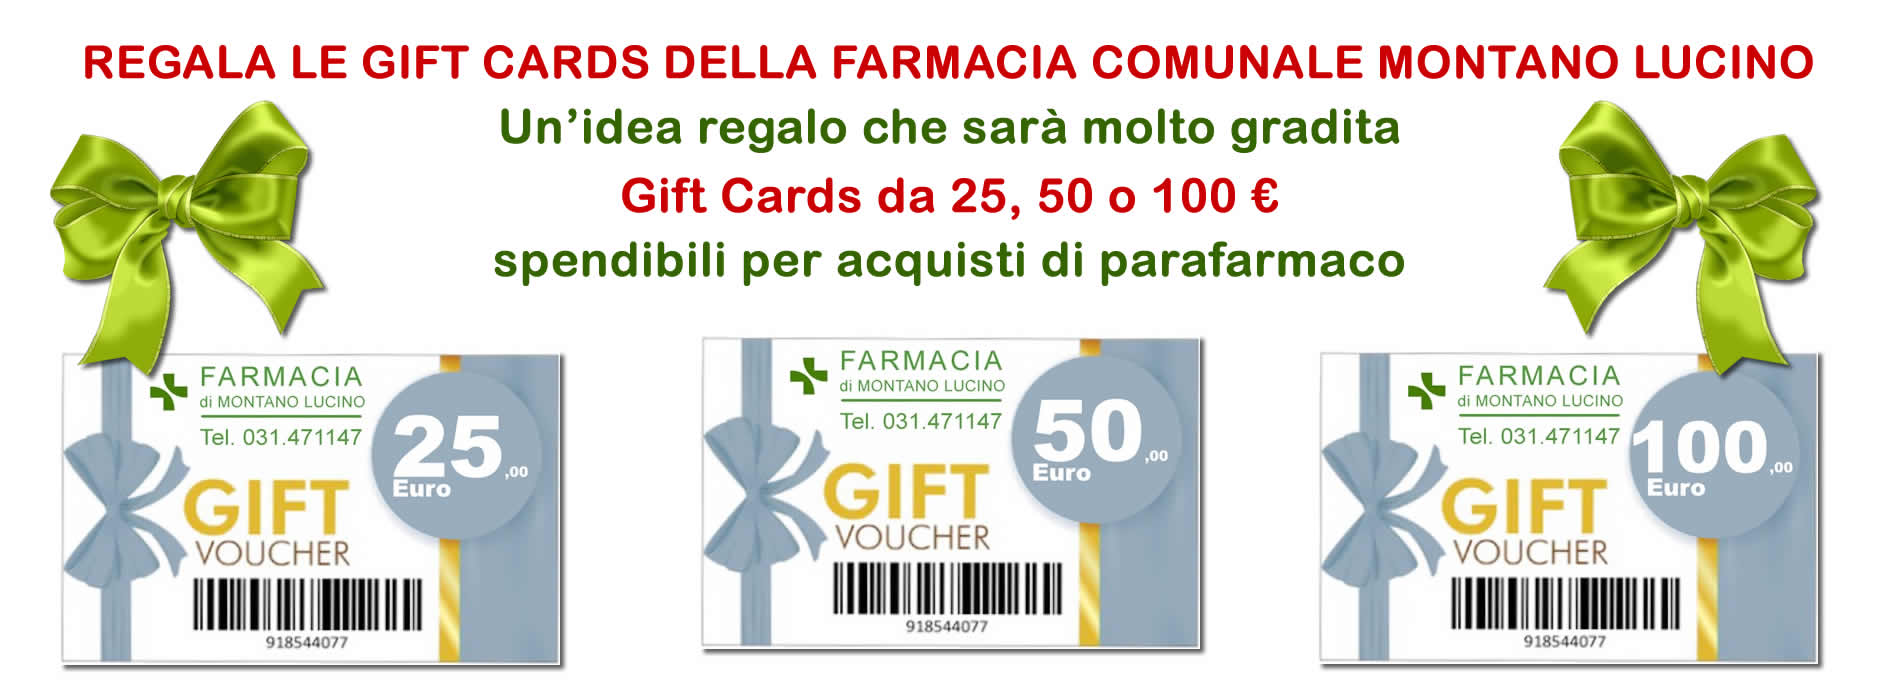 Gif-cards-home-doponatale-2